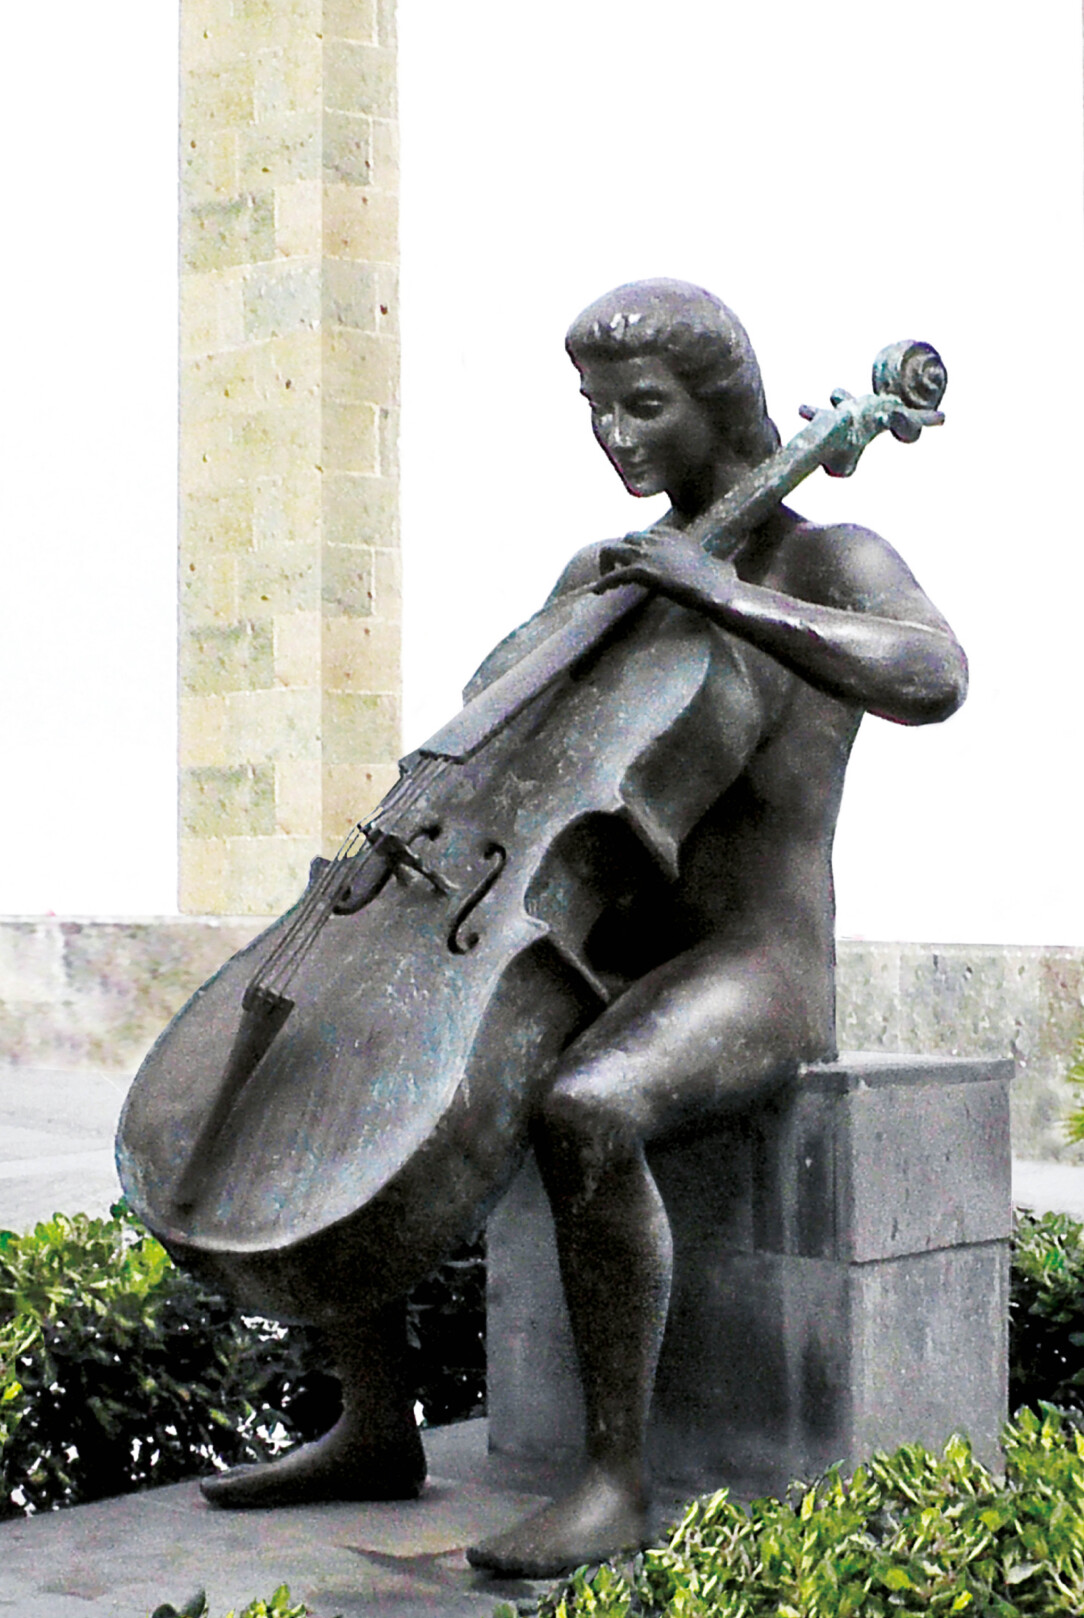 Staty med vionchello